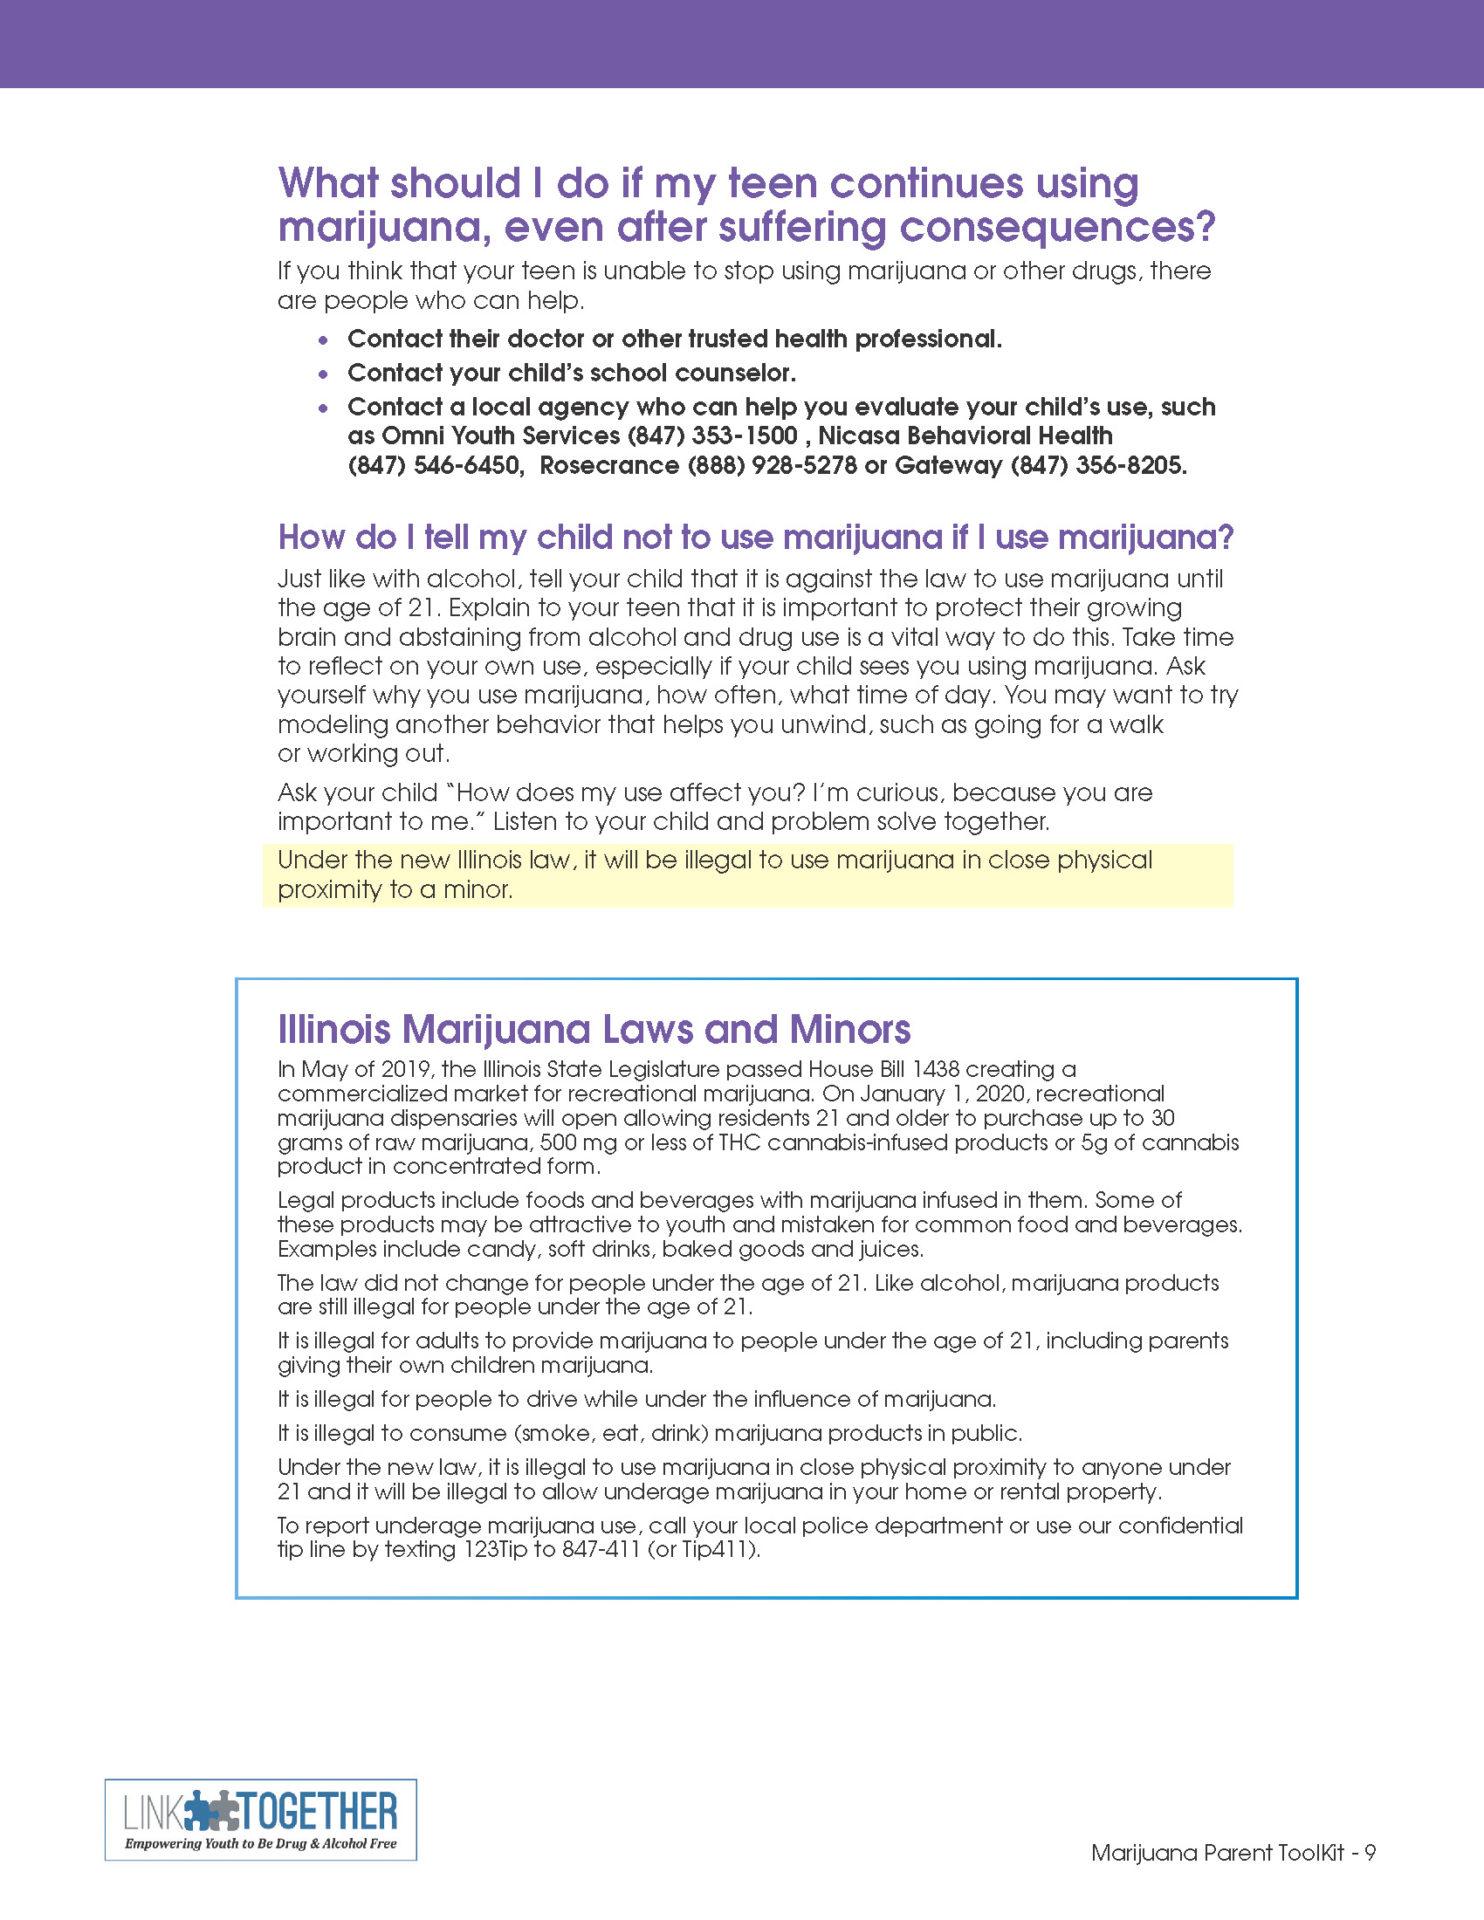 Link Together Marijuana Toolkit_Page_11